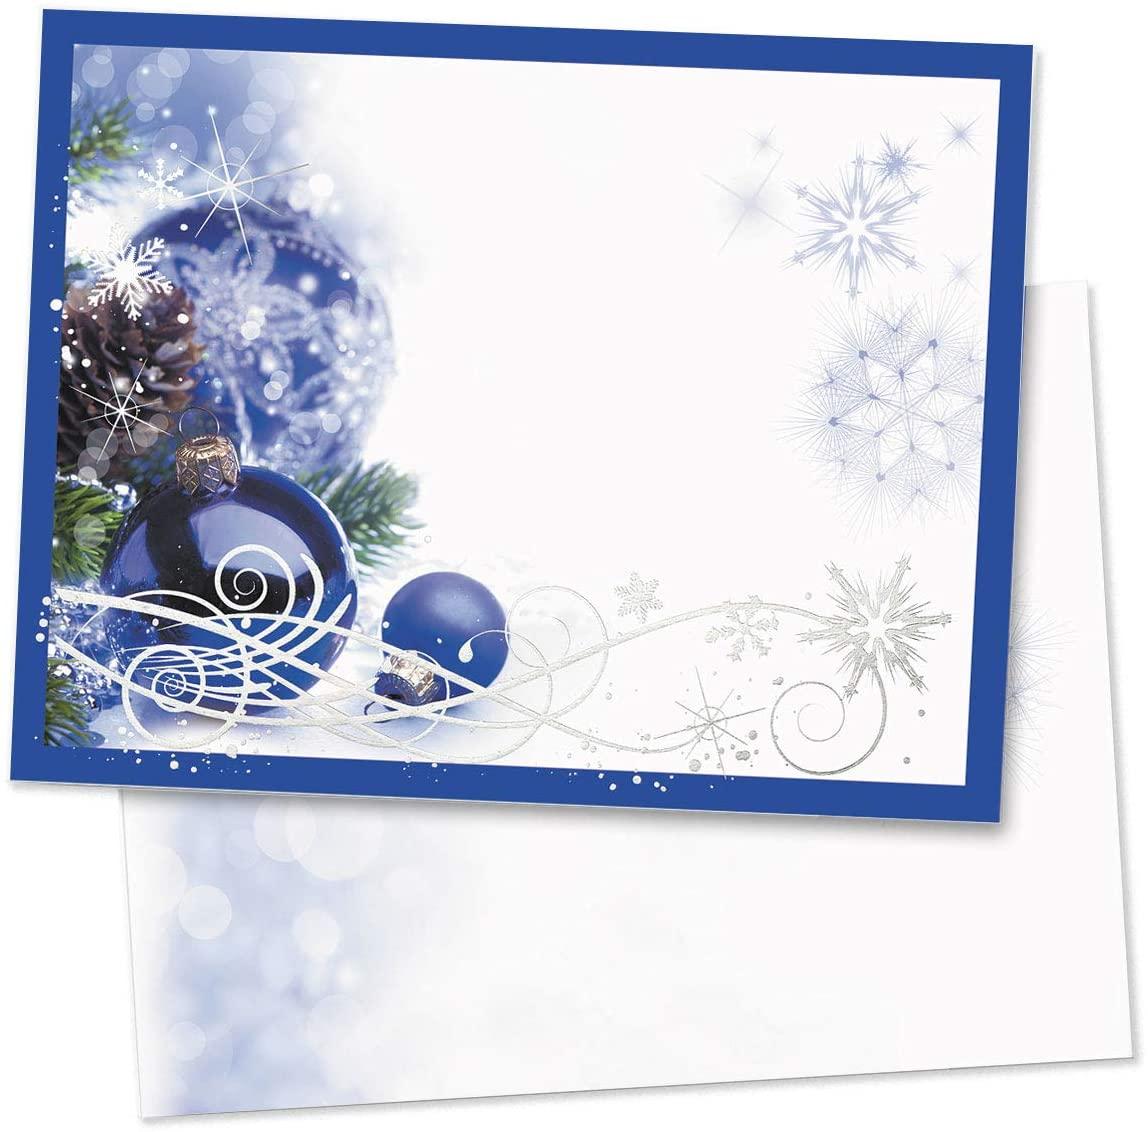 PaperDirect Sapphire Christmas Postcards, Silver Foil, Standard Size, 100 Count